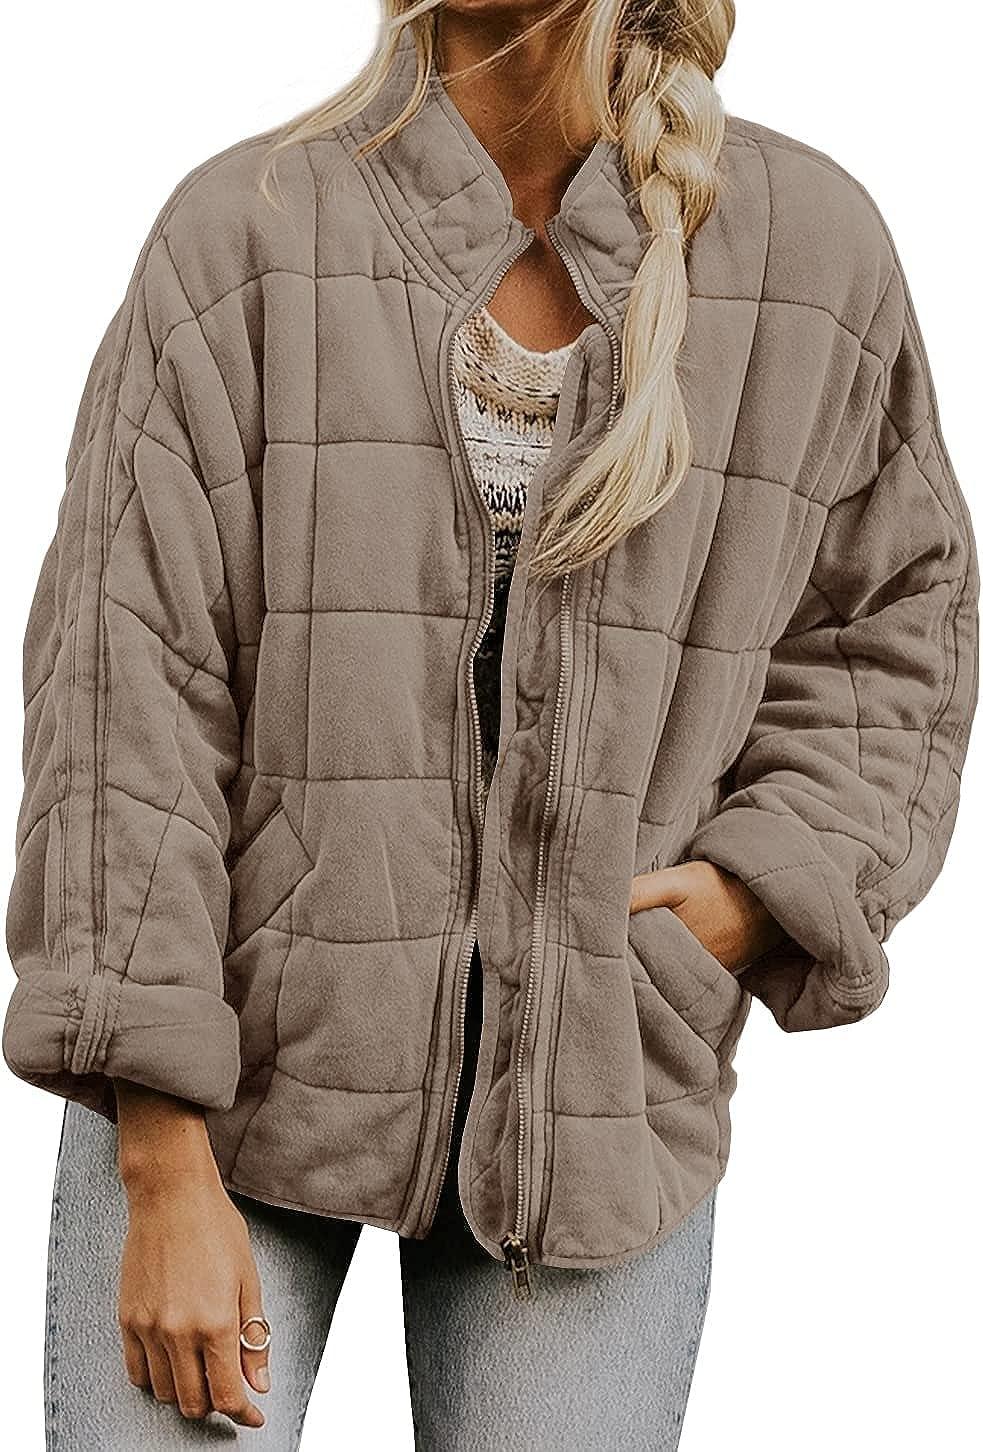 Autumn Winter Womens Dolman Lightweight Quilted Jackets Coat Stand Neck Long Sleeve Zipper with Pockets Outwear